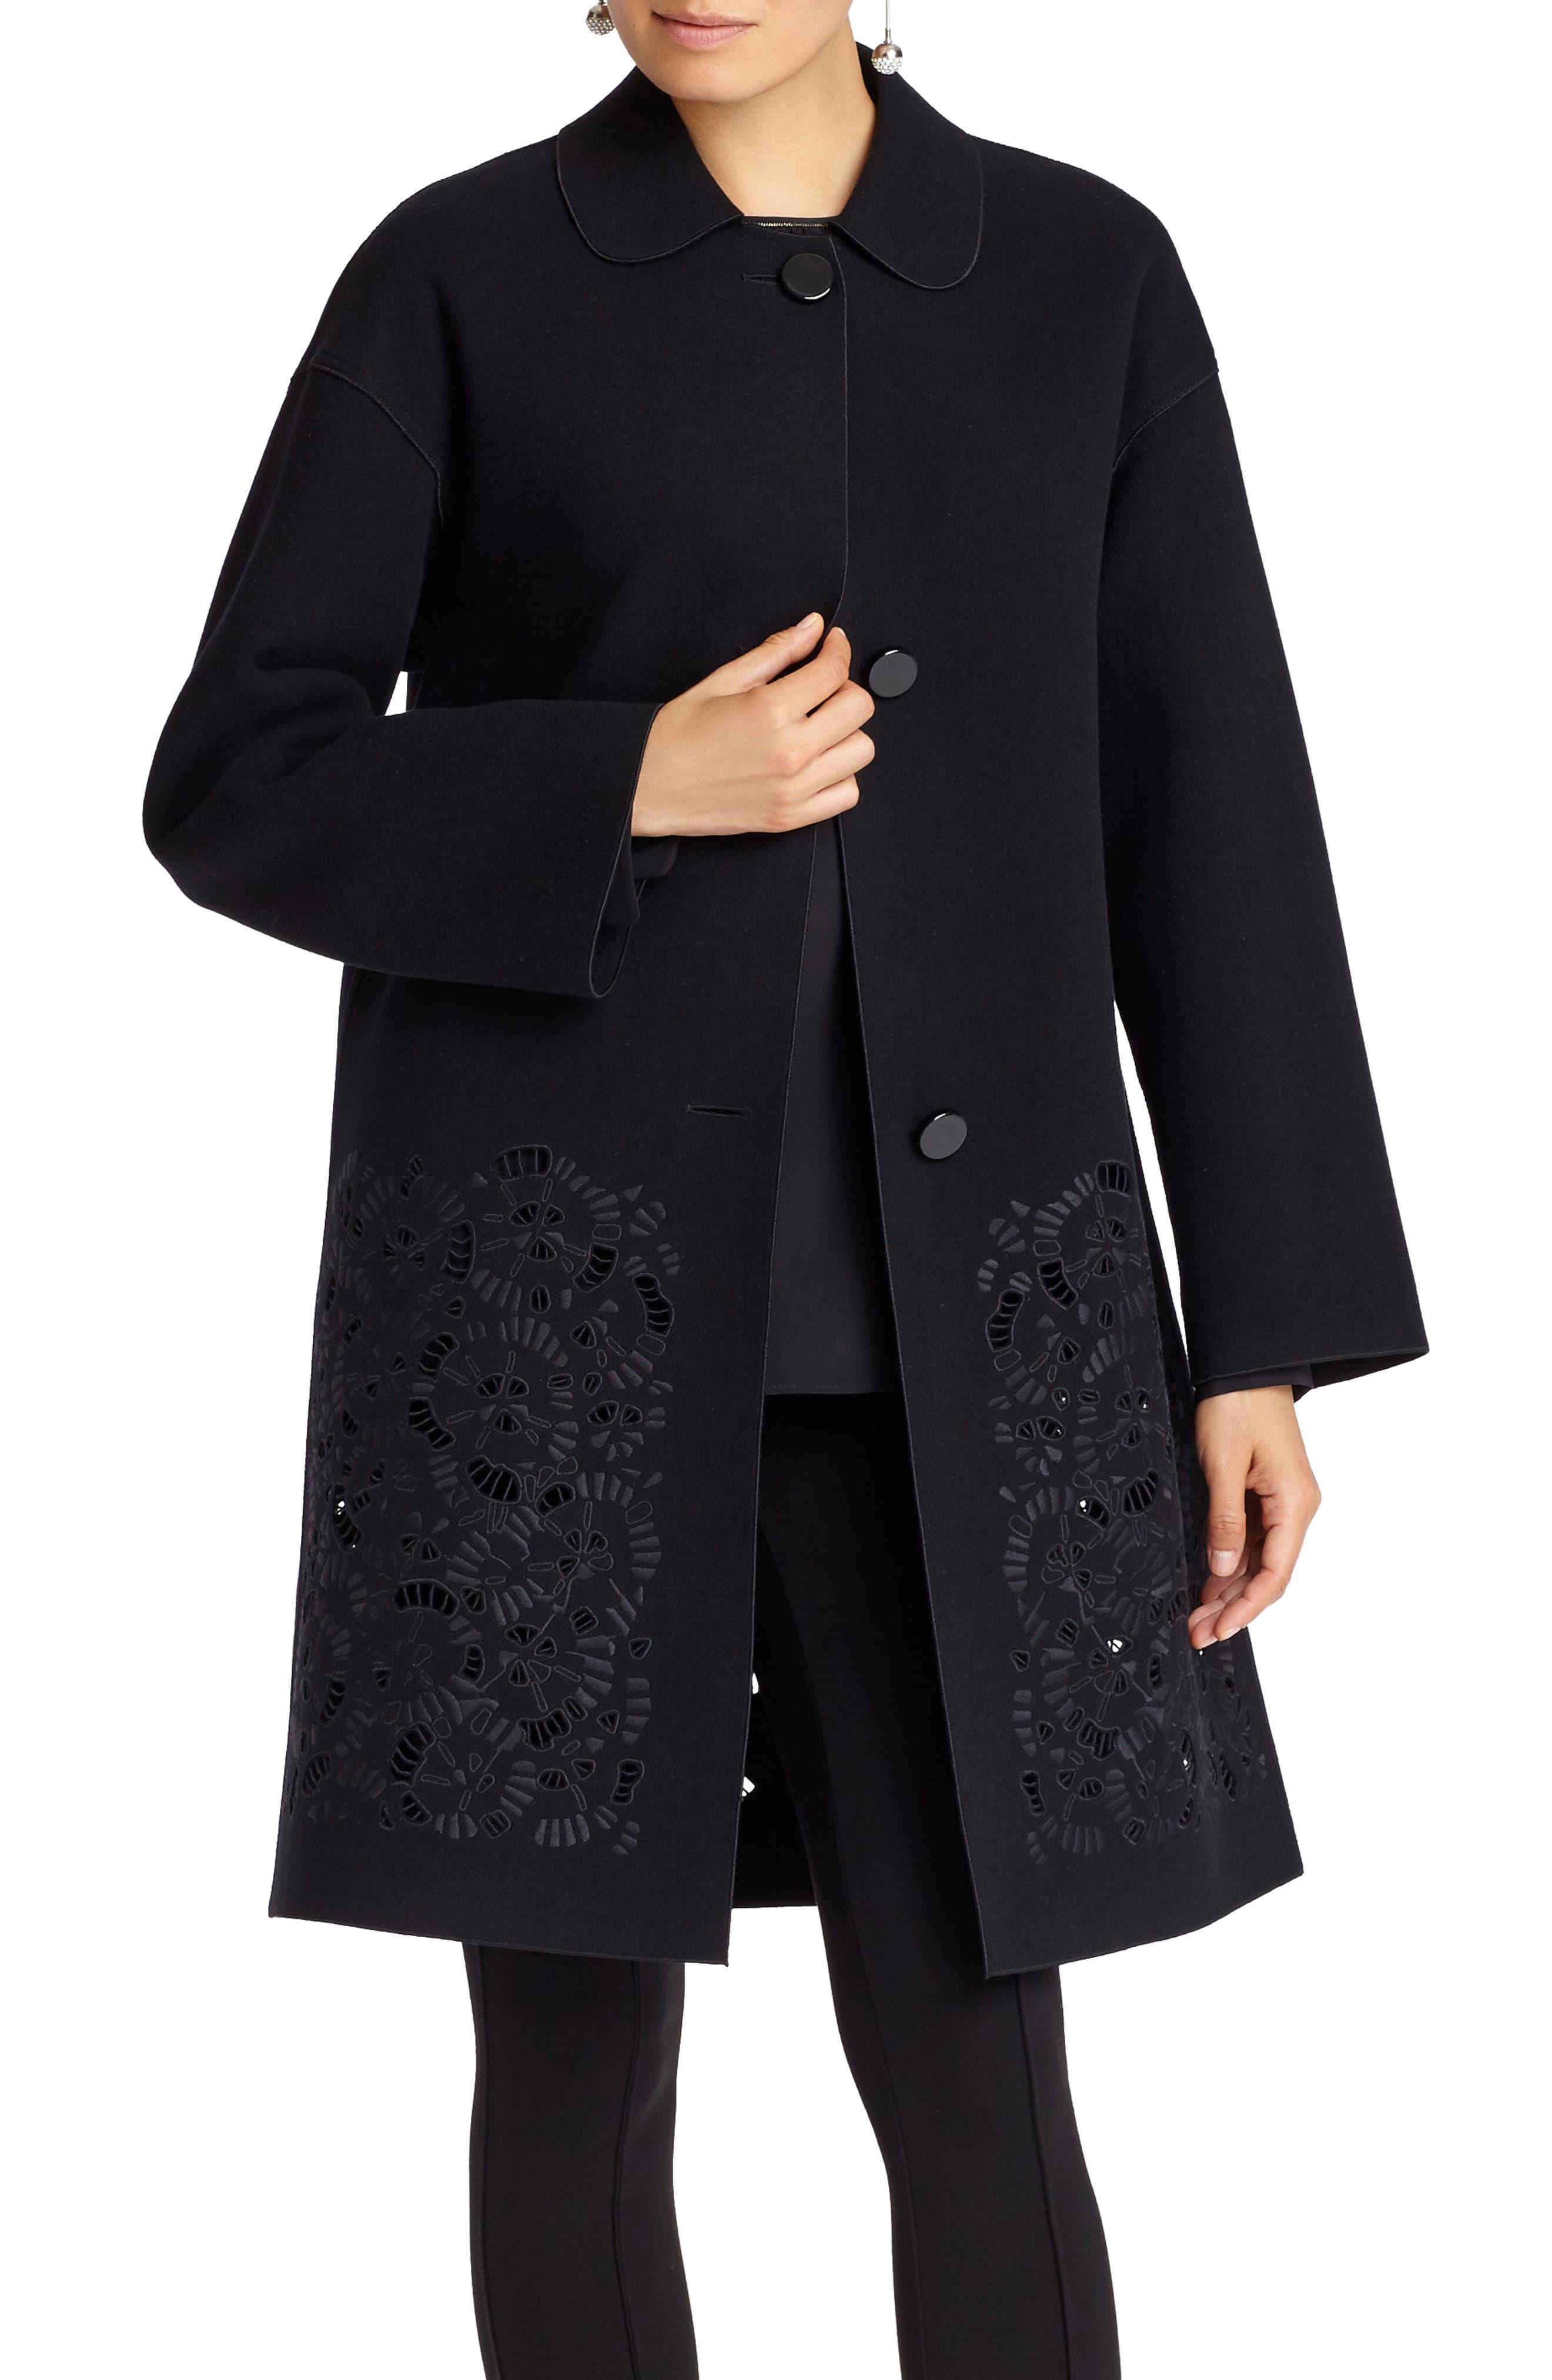 Main Image - Lafayette 148 New York Vita Laser Cut Embroidered Coat